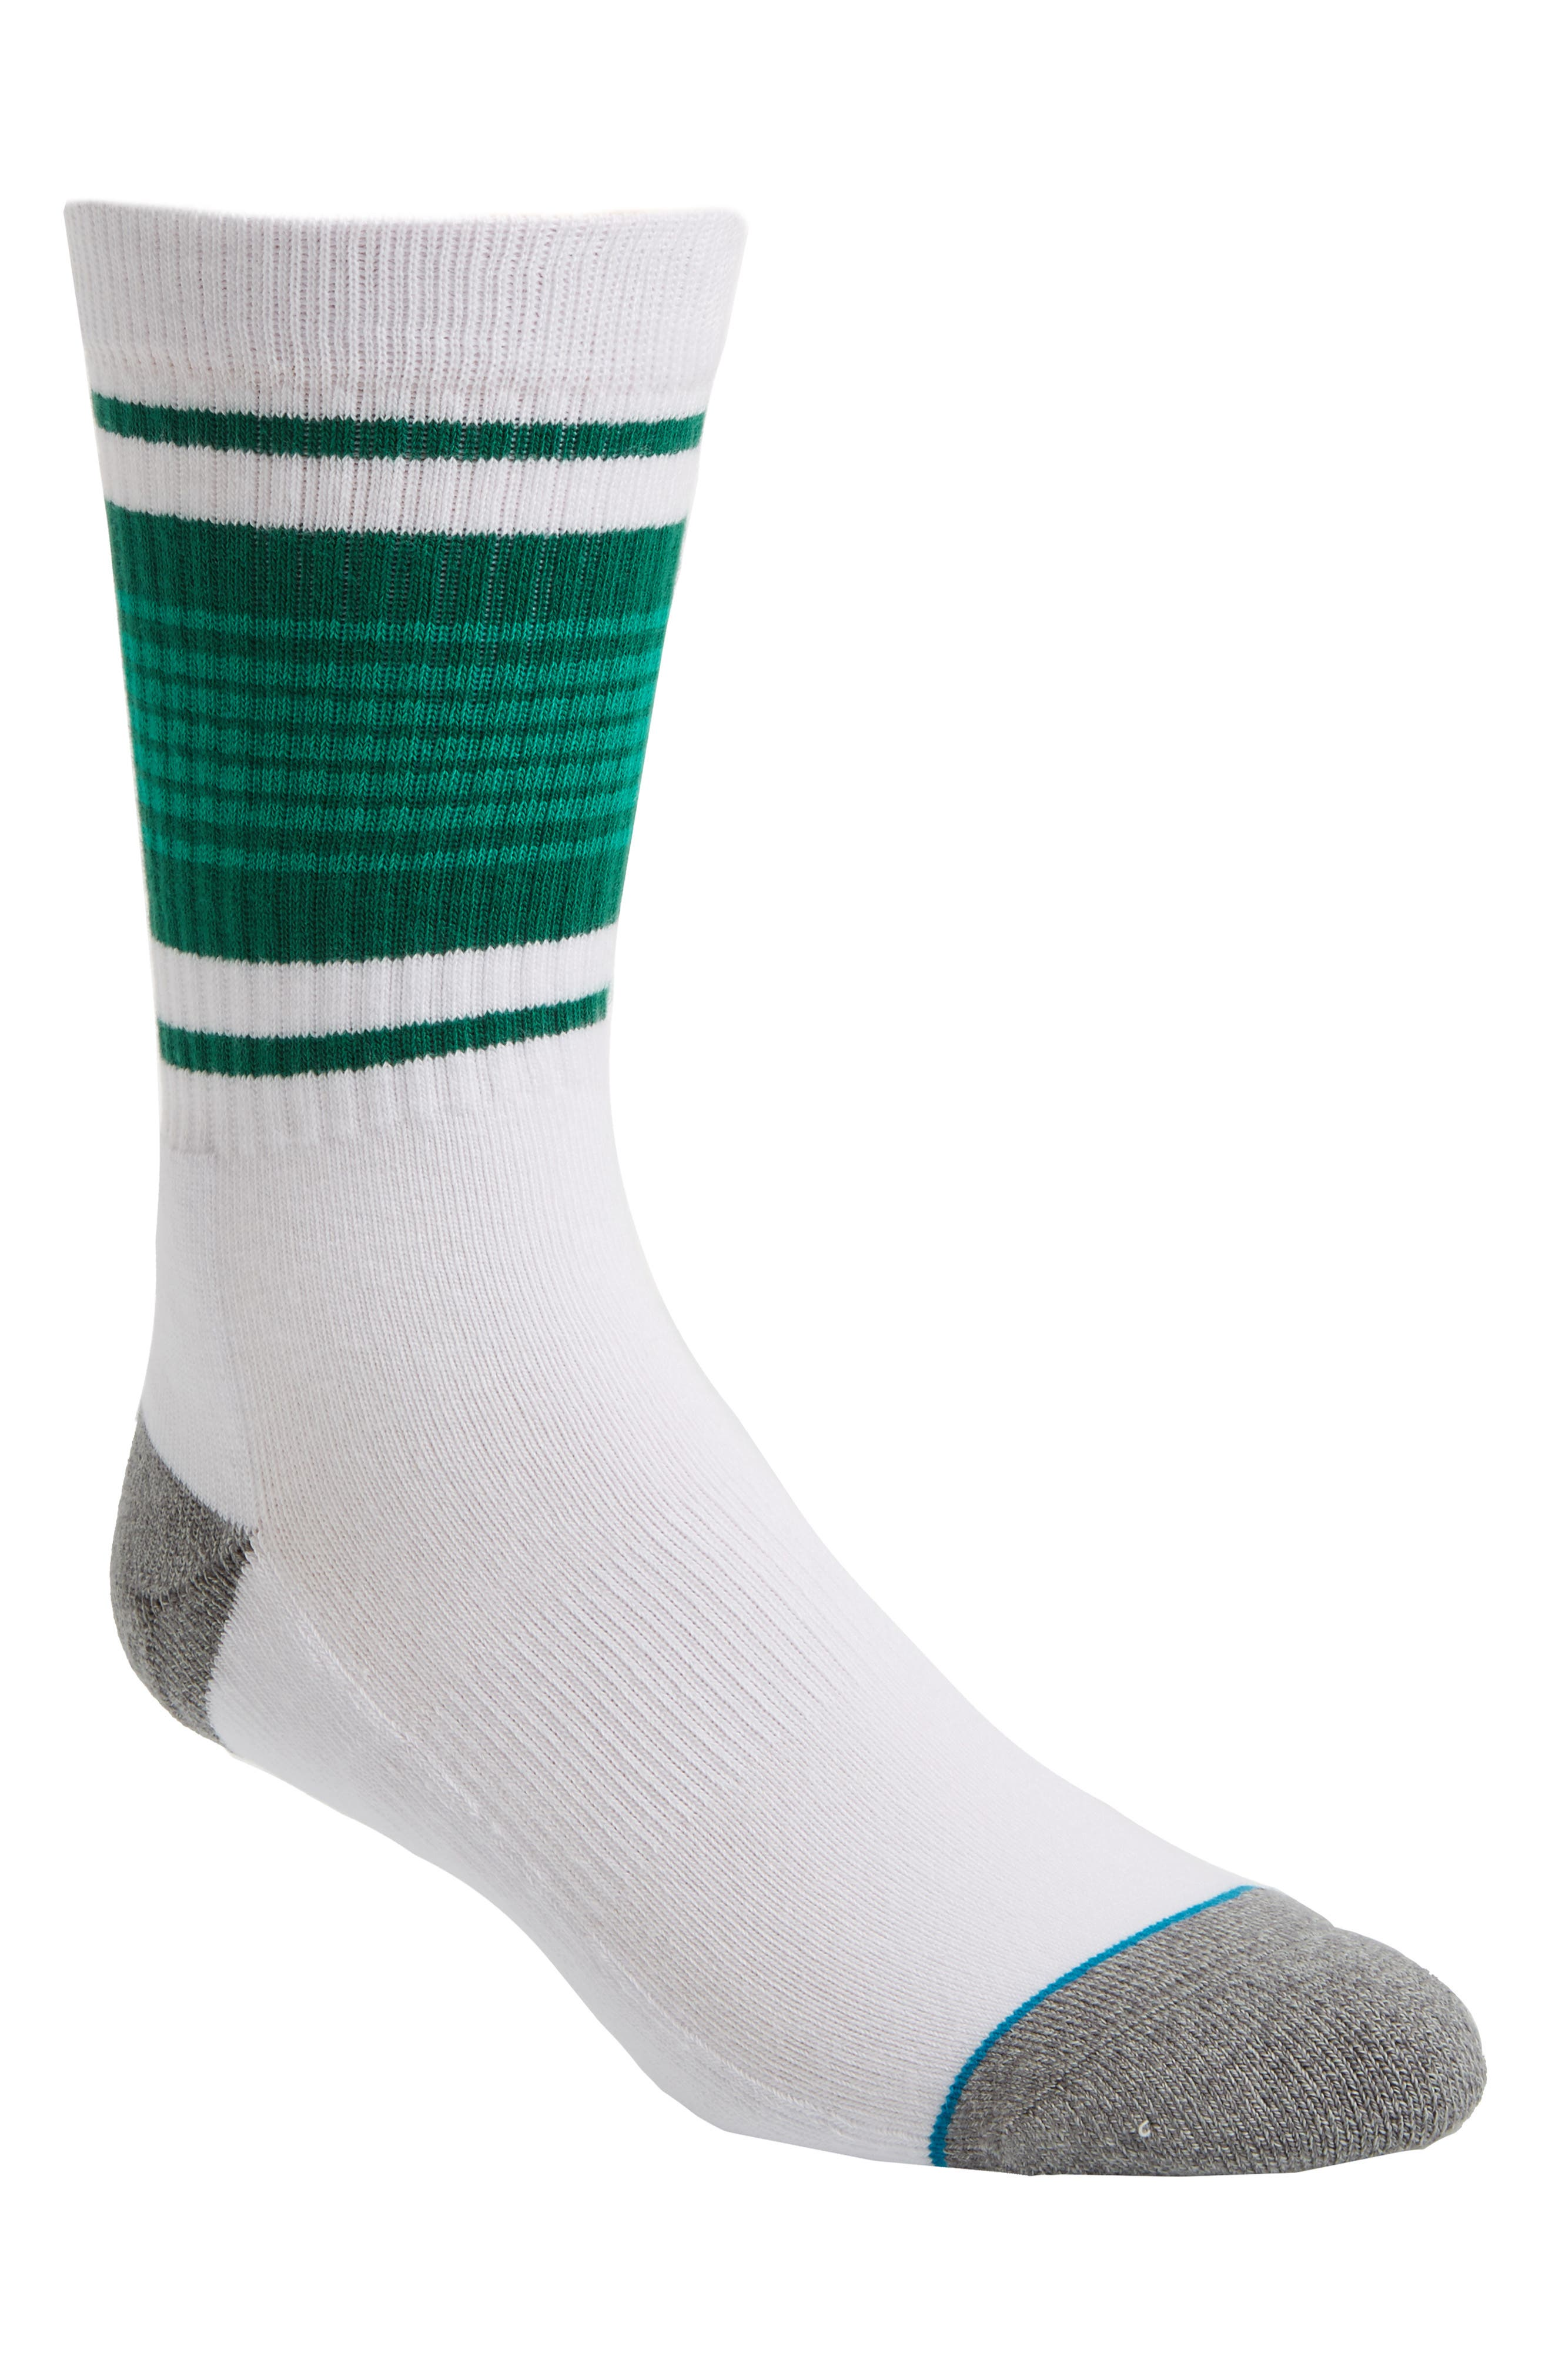 Blanco Socks,                             Main thumbnail 1, color,                             300